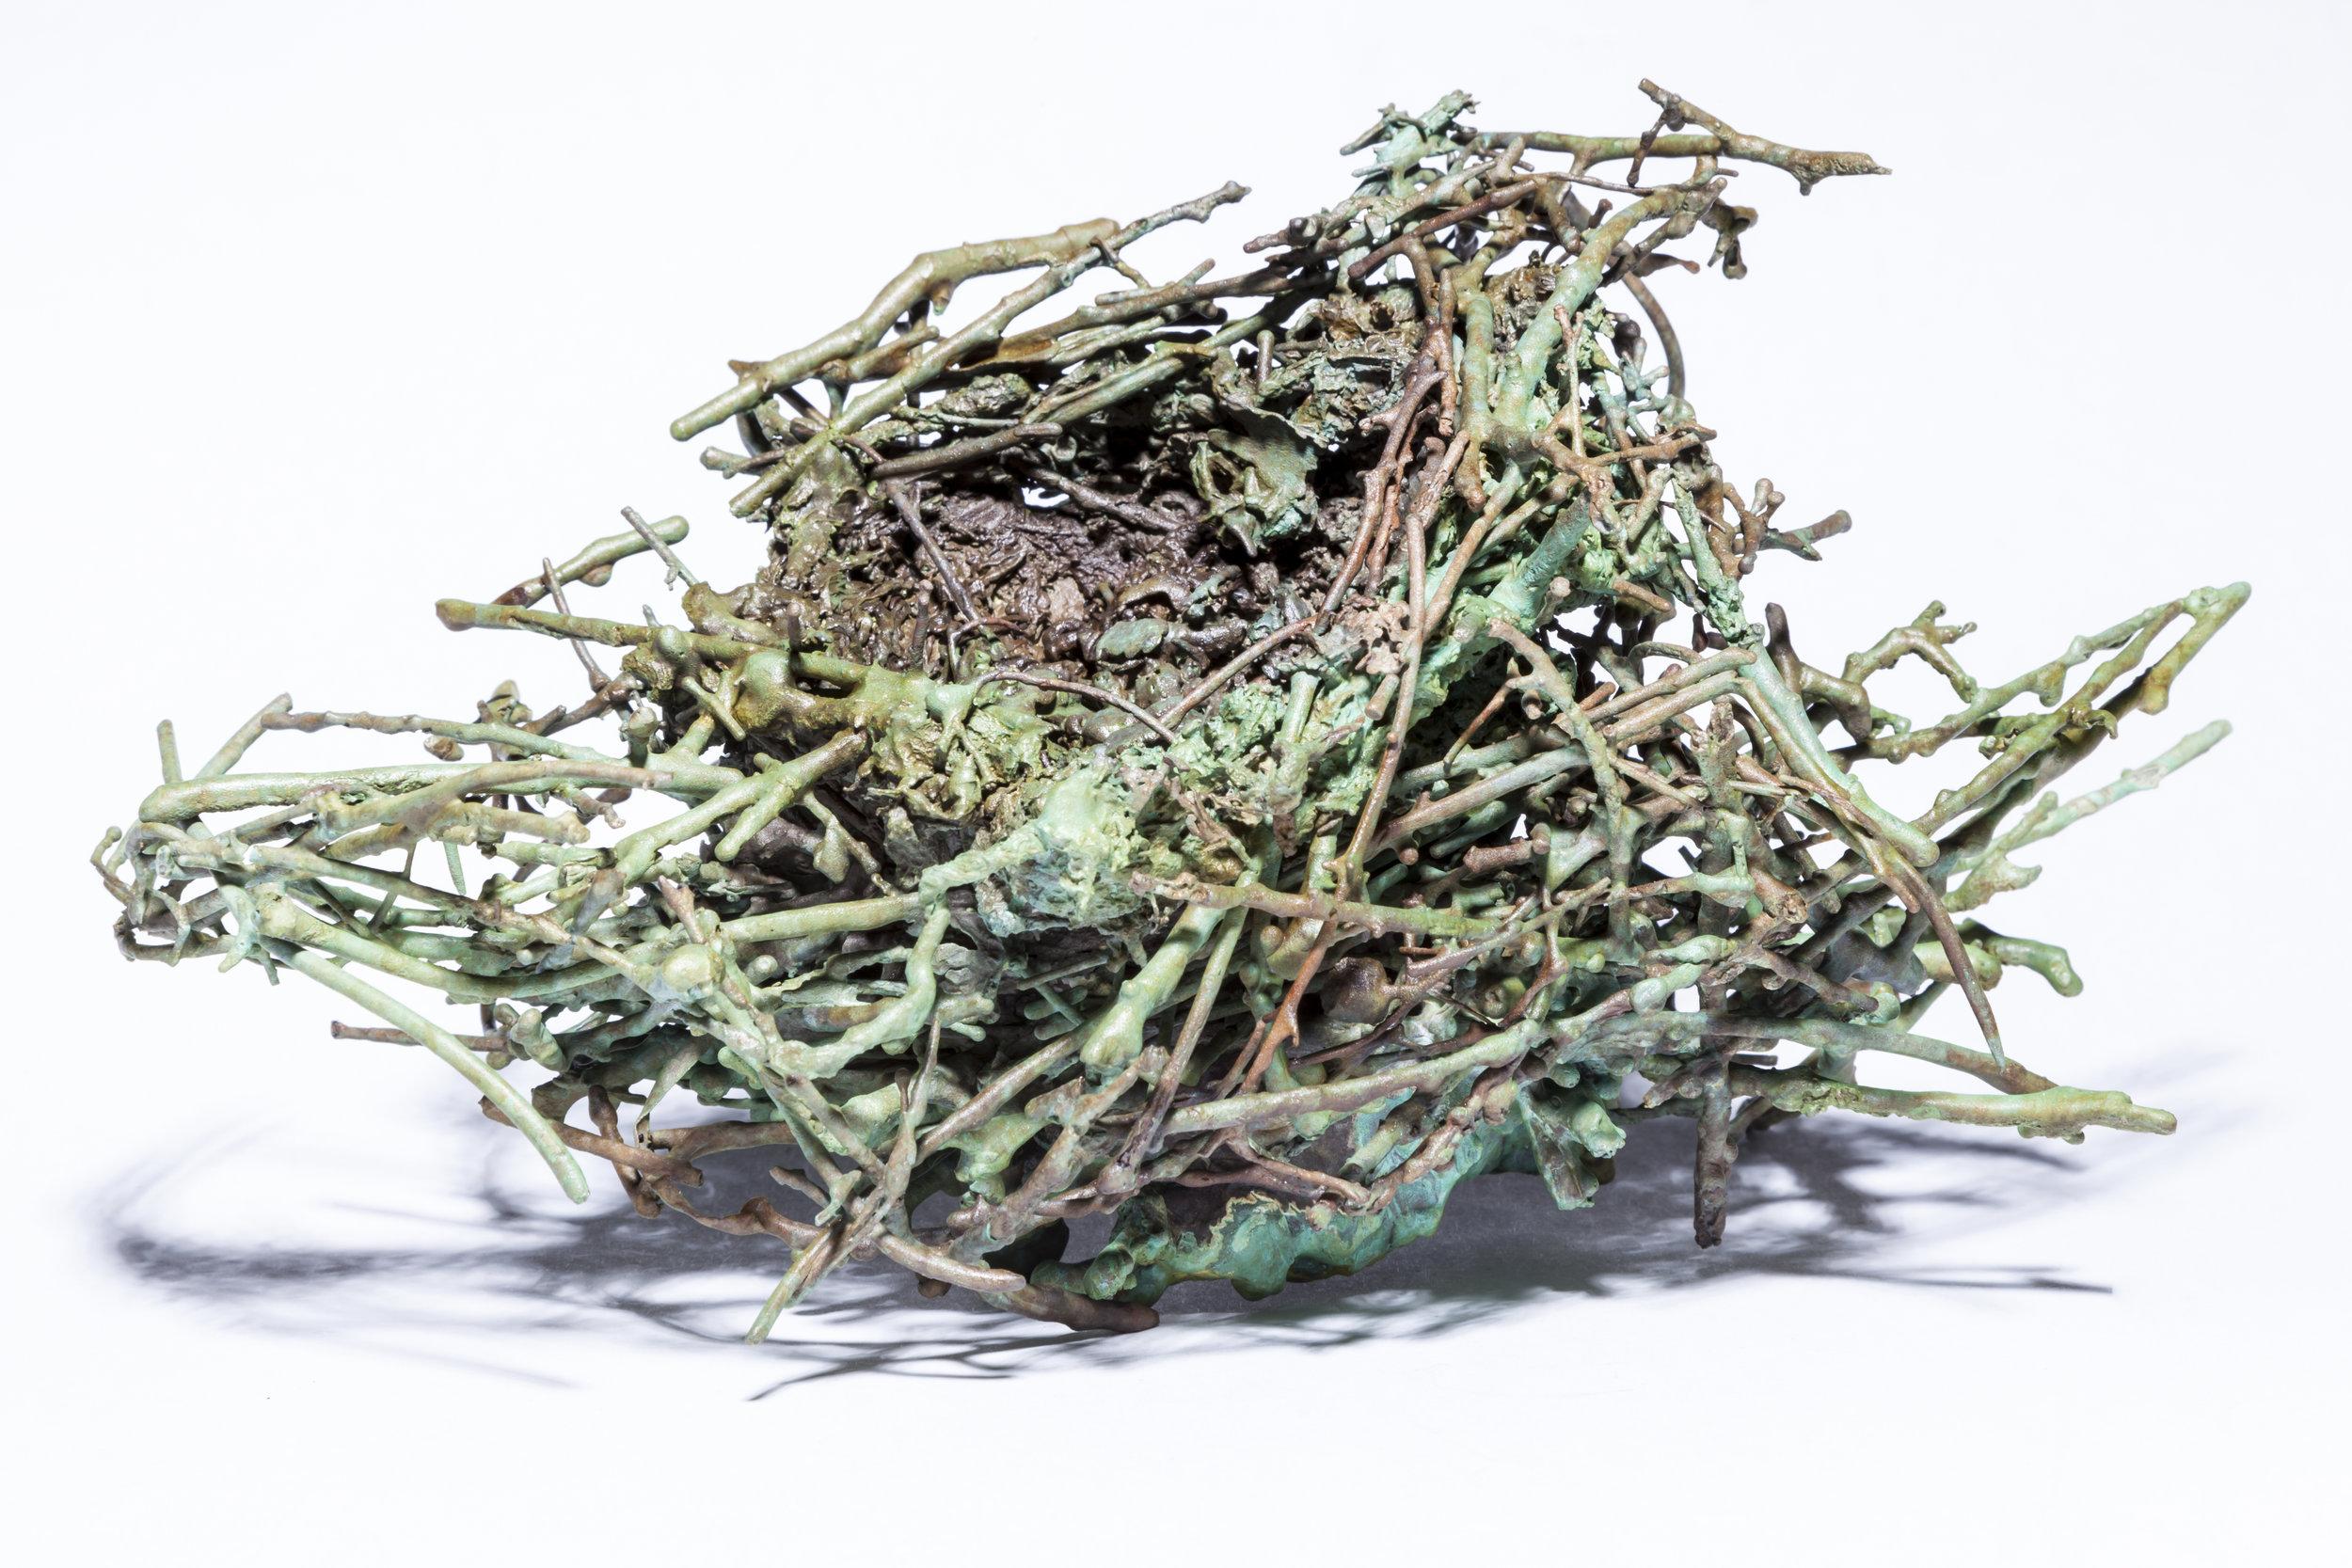 BaleCreekAllen Nests-025.jpg